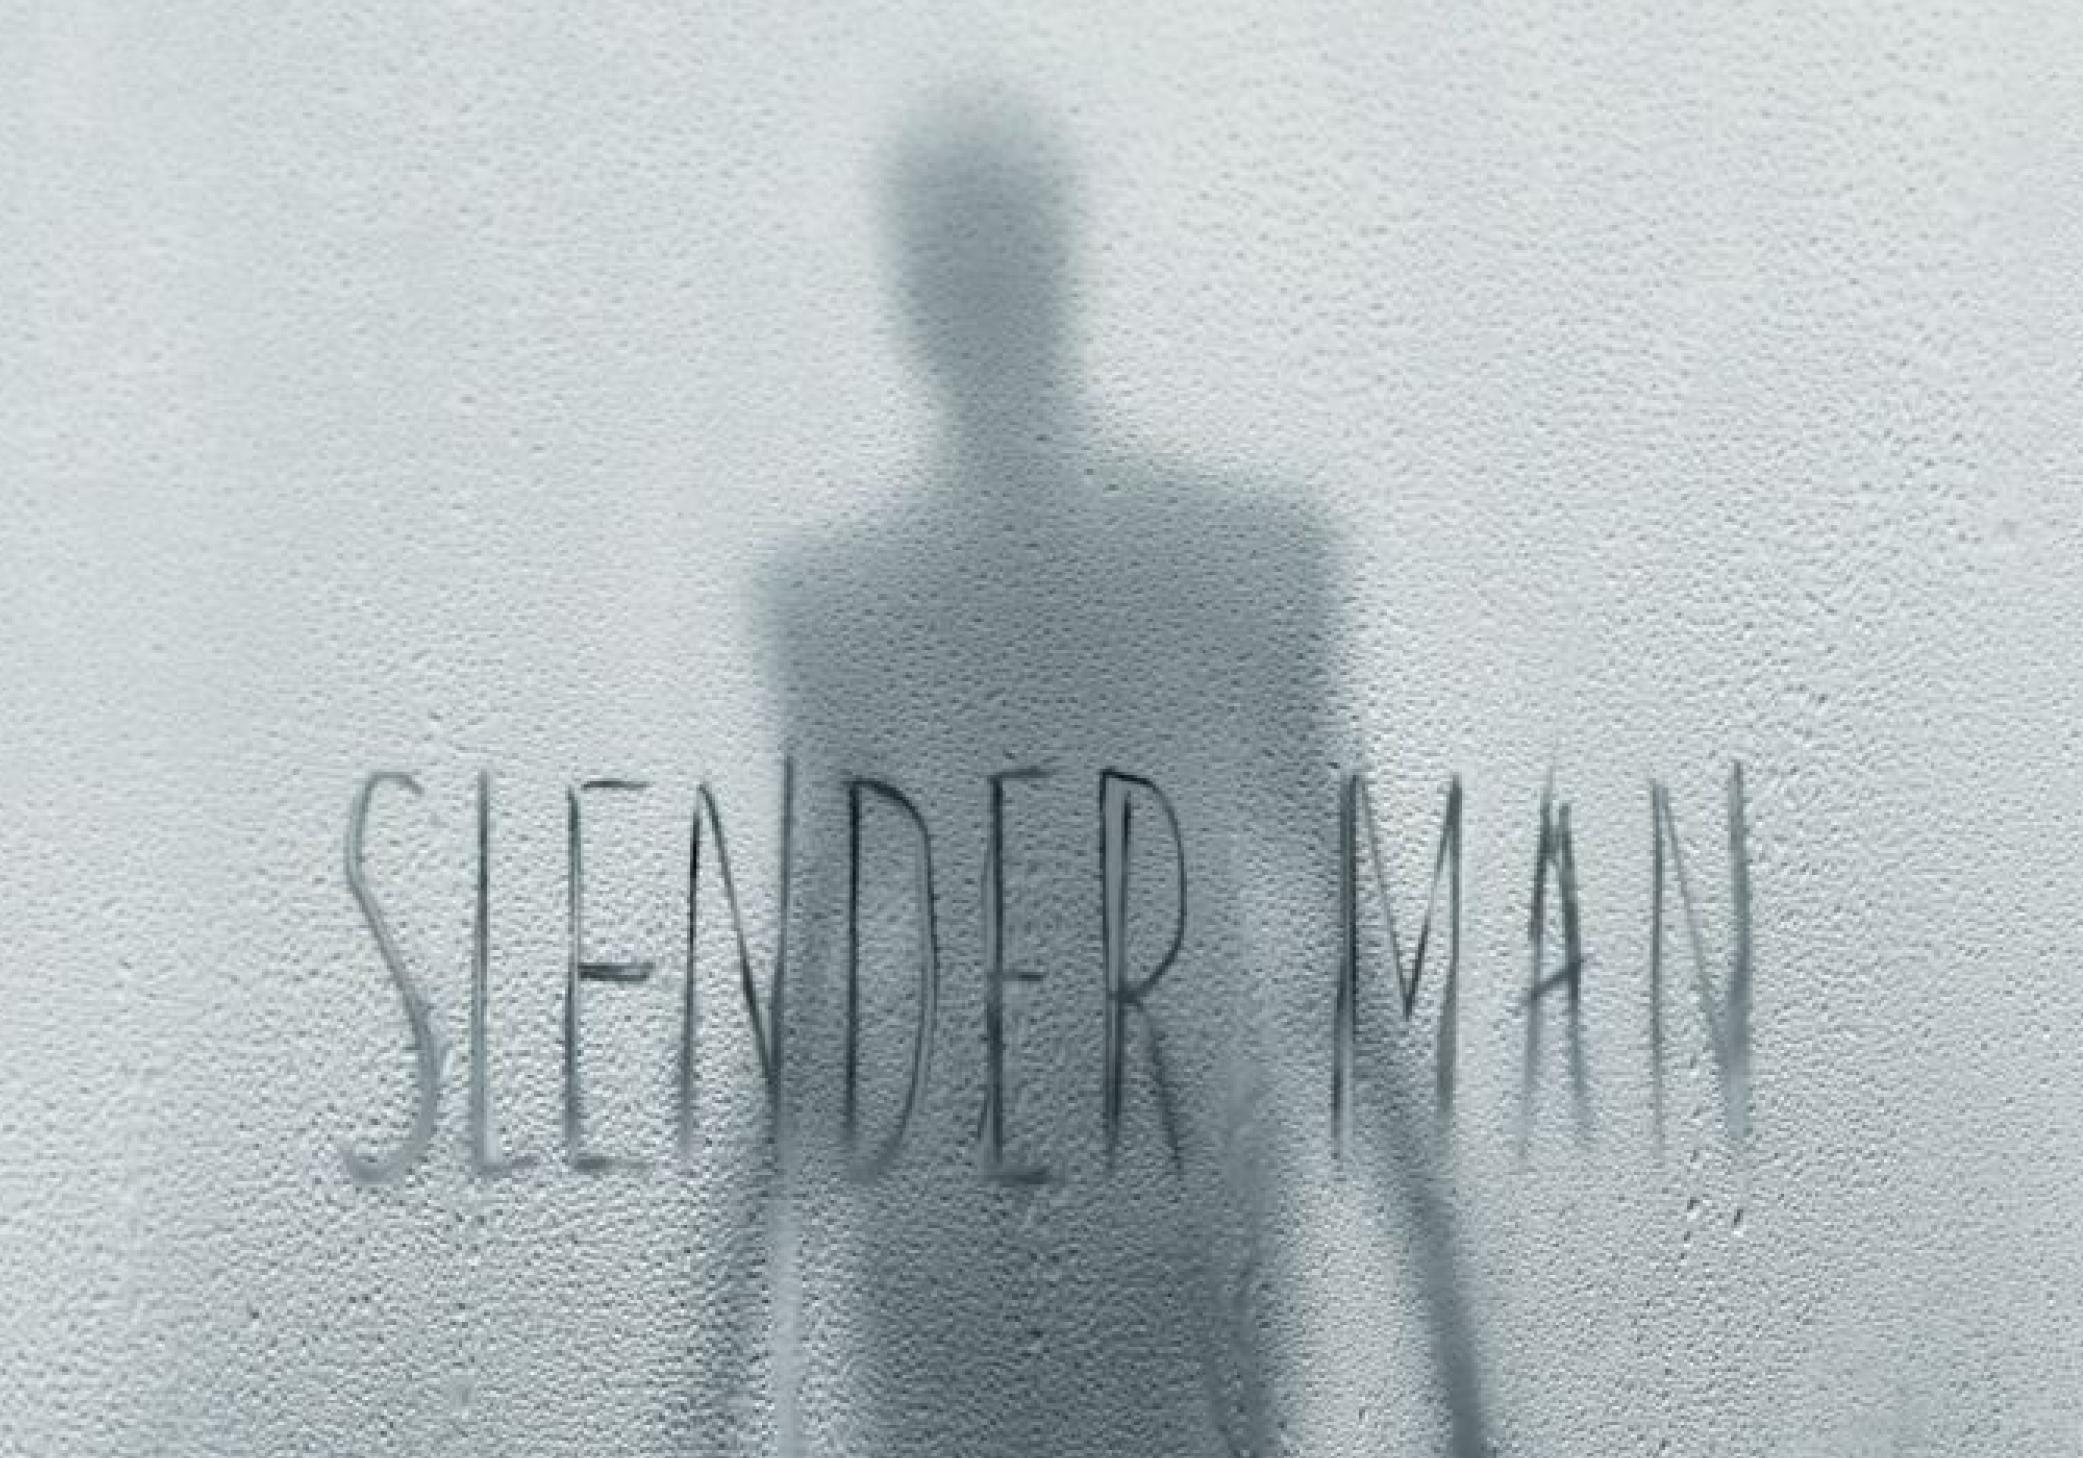 Slender Man le film